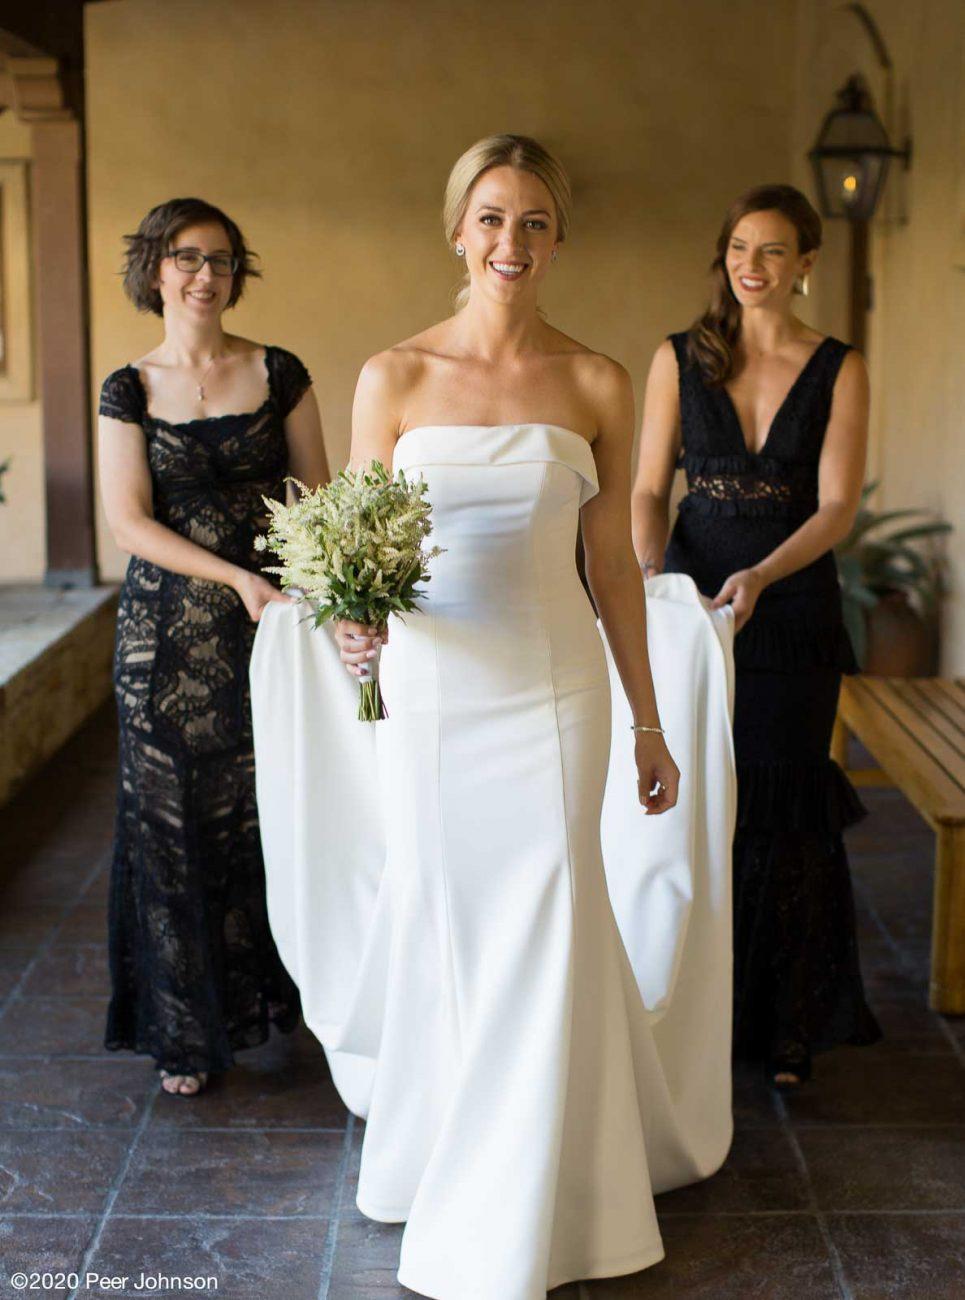 Tehama Carmel Bridesmaids